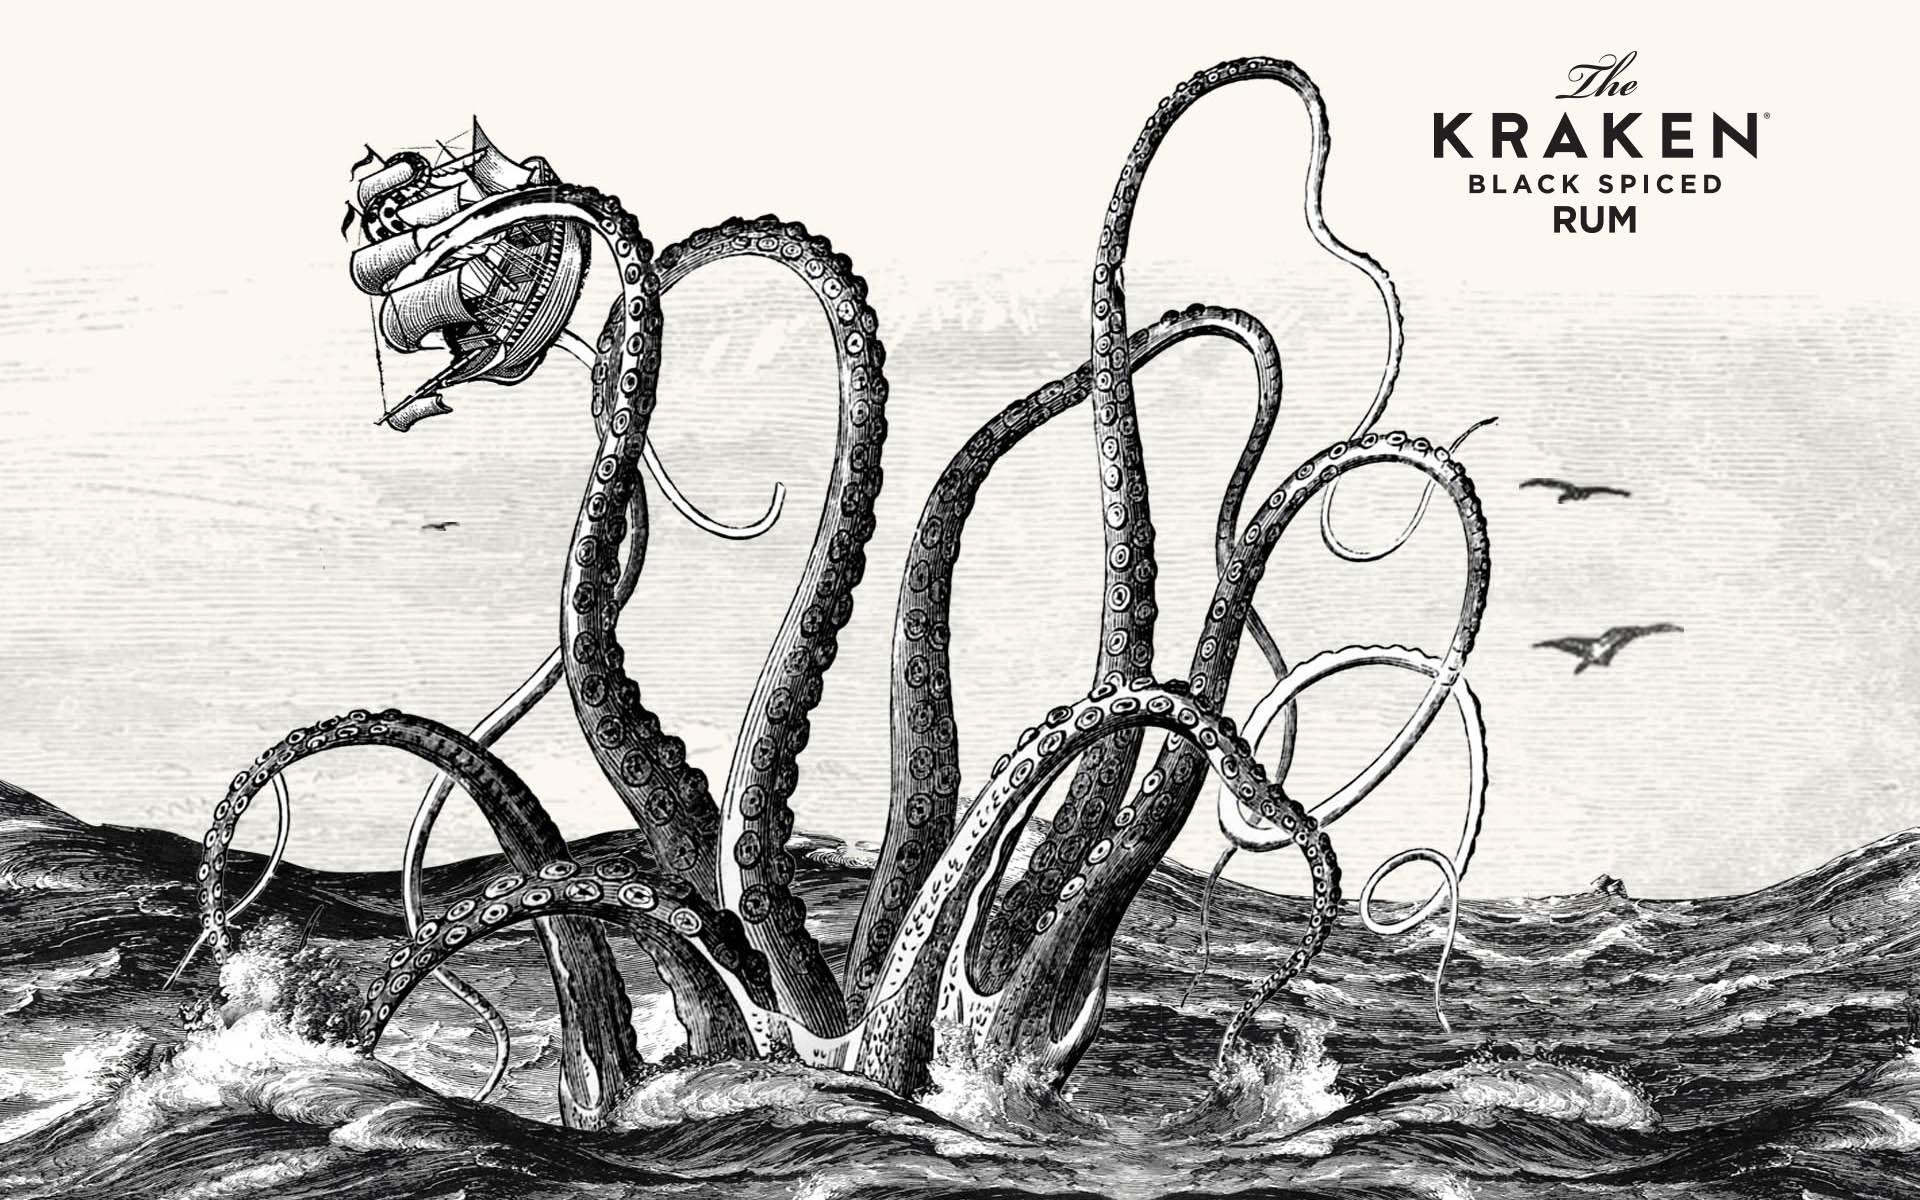 Fond D Ecran Illustration Kraken Les Monstres Marins Bateau A